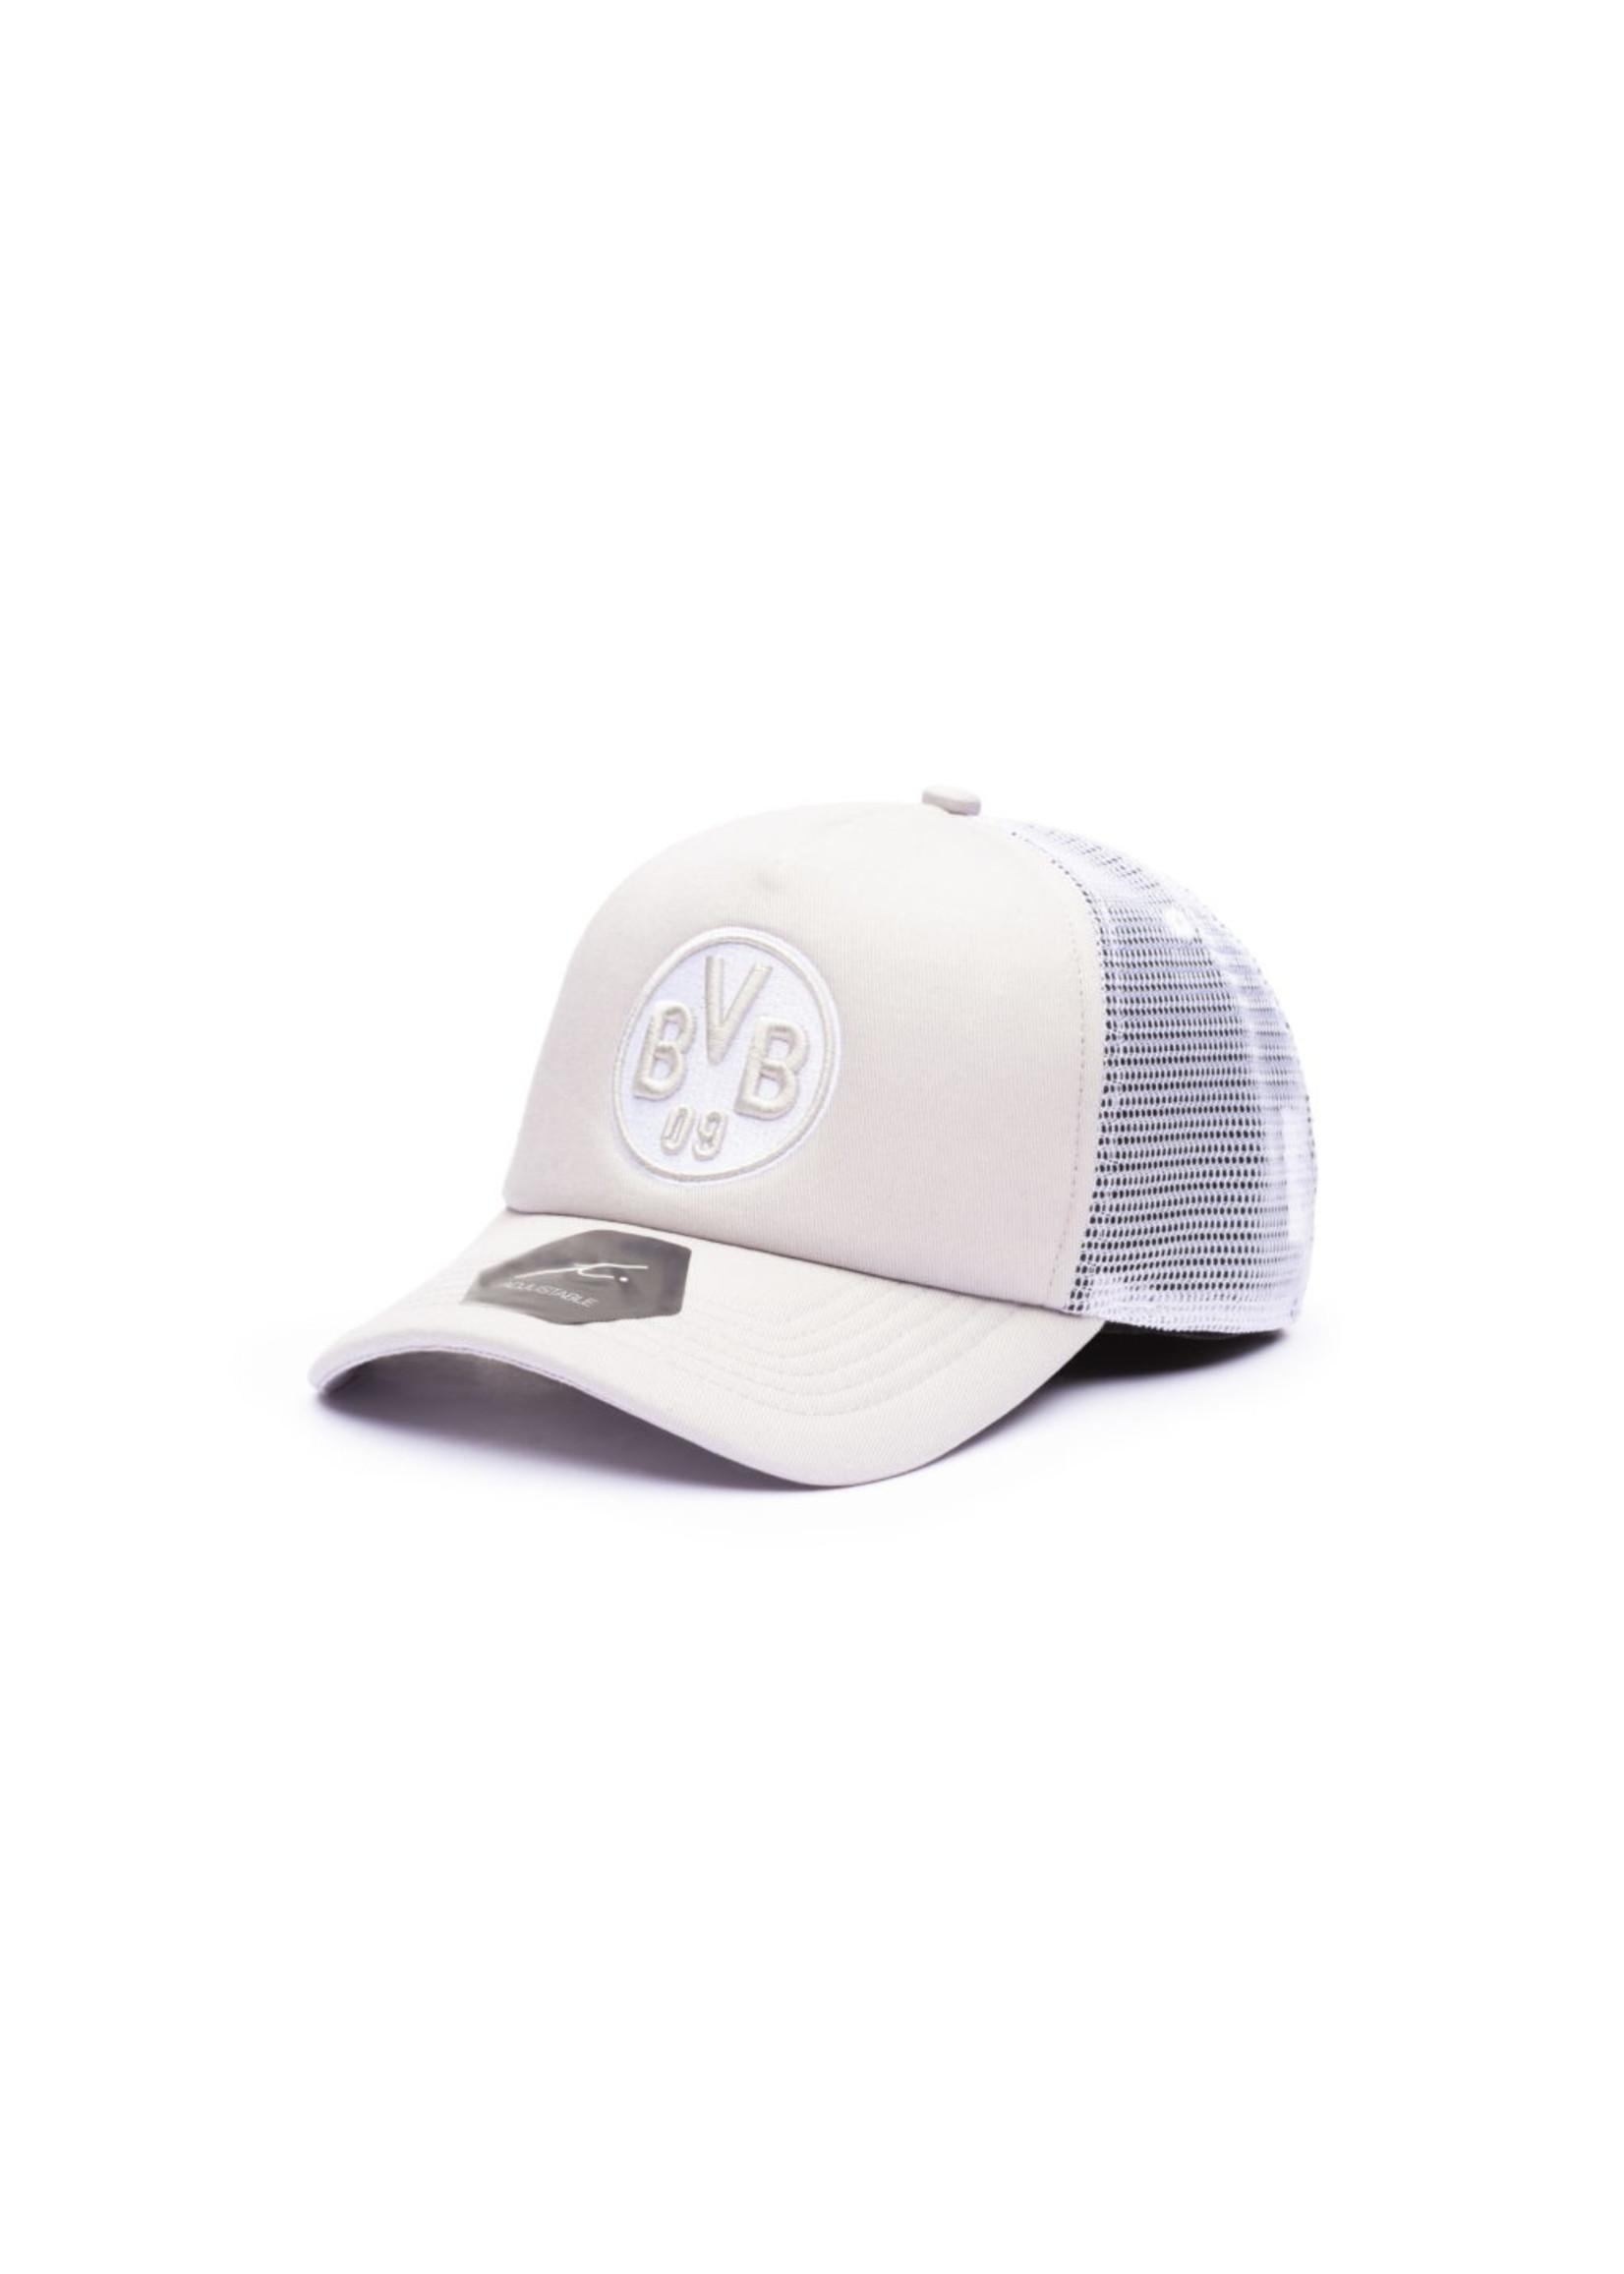 Borussia Dortmund Mesh Backed Baseball Hat